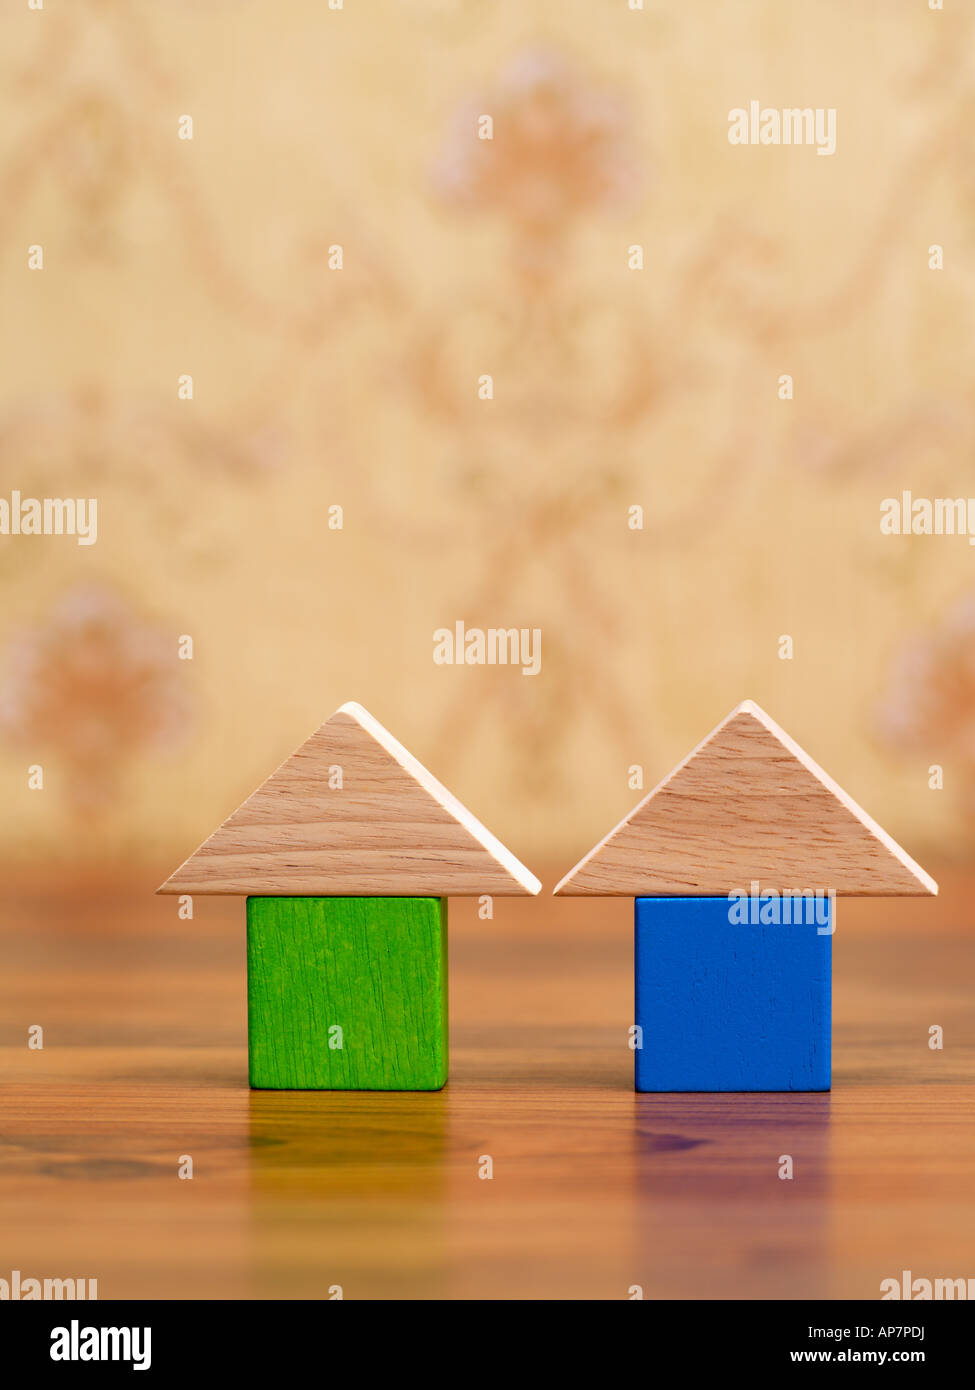 Building block houses - Stock Image